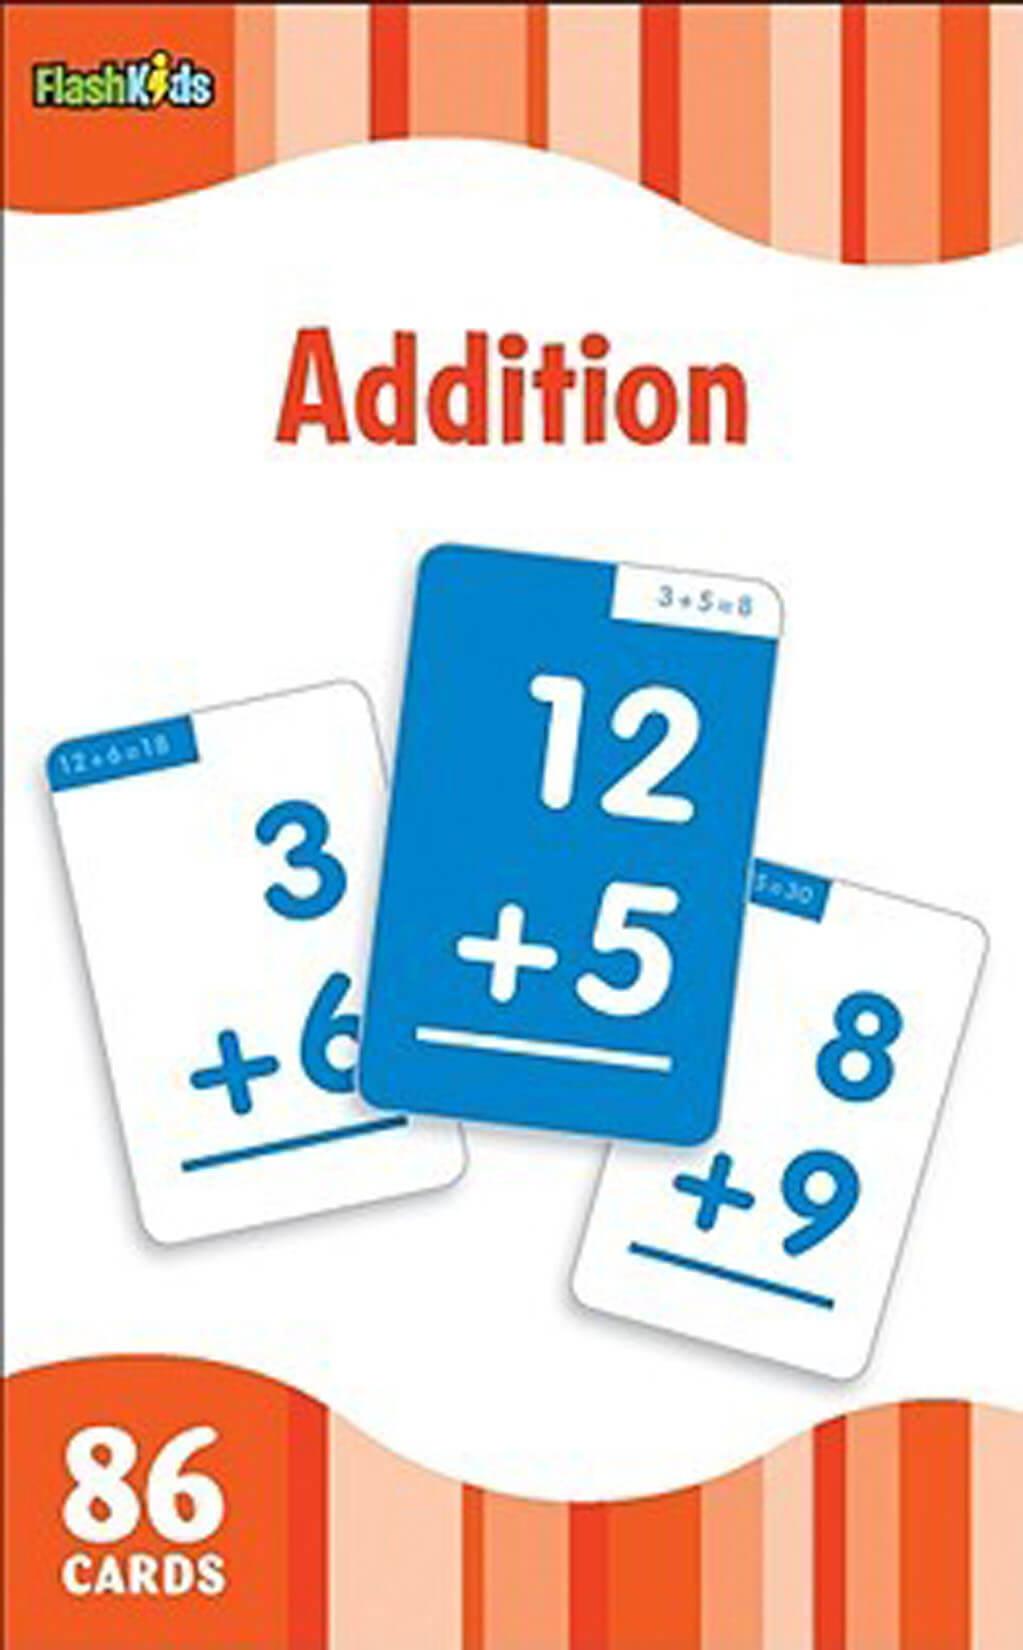 Addition Flashcards